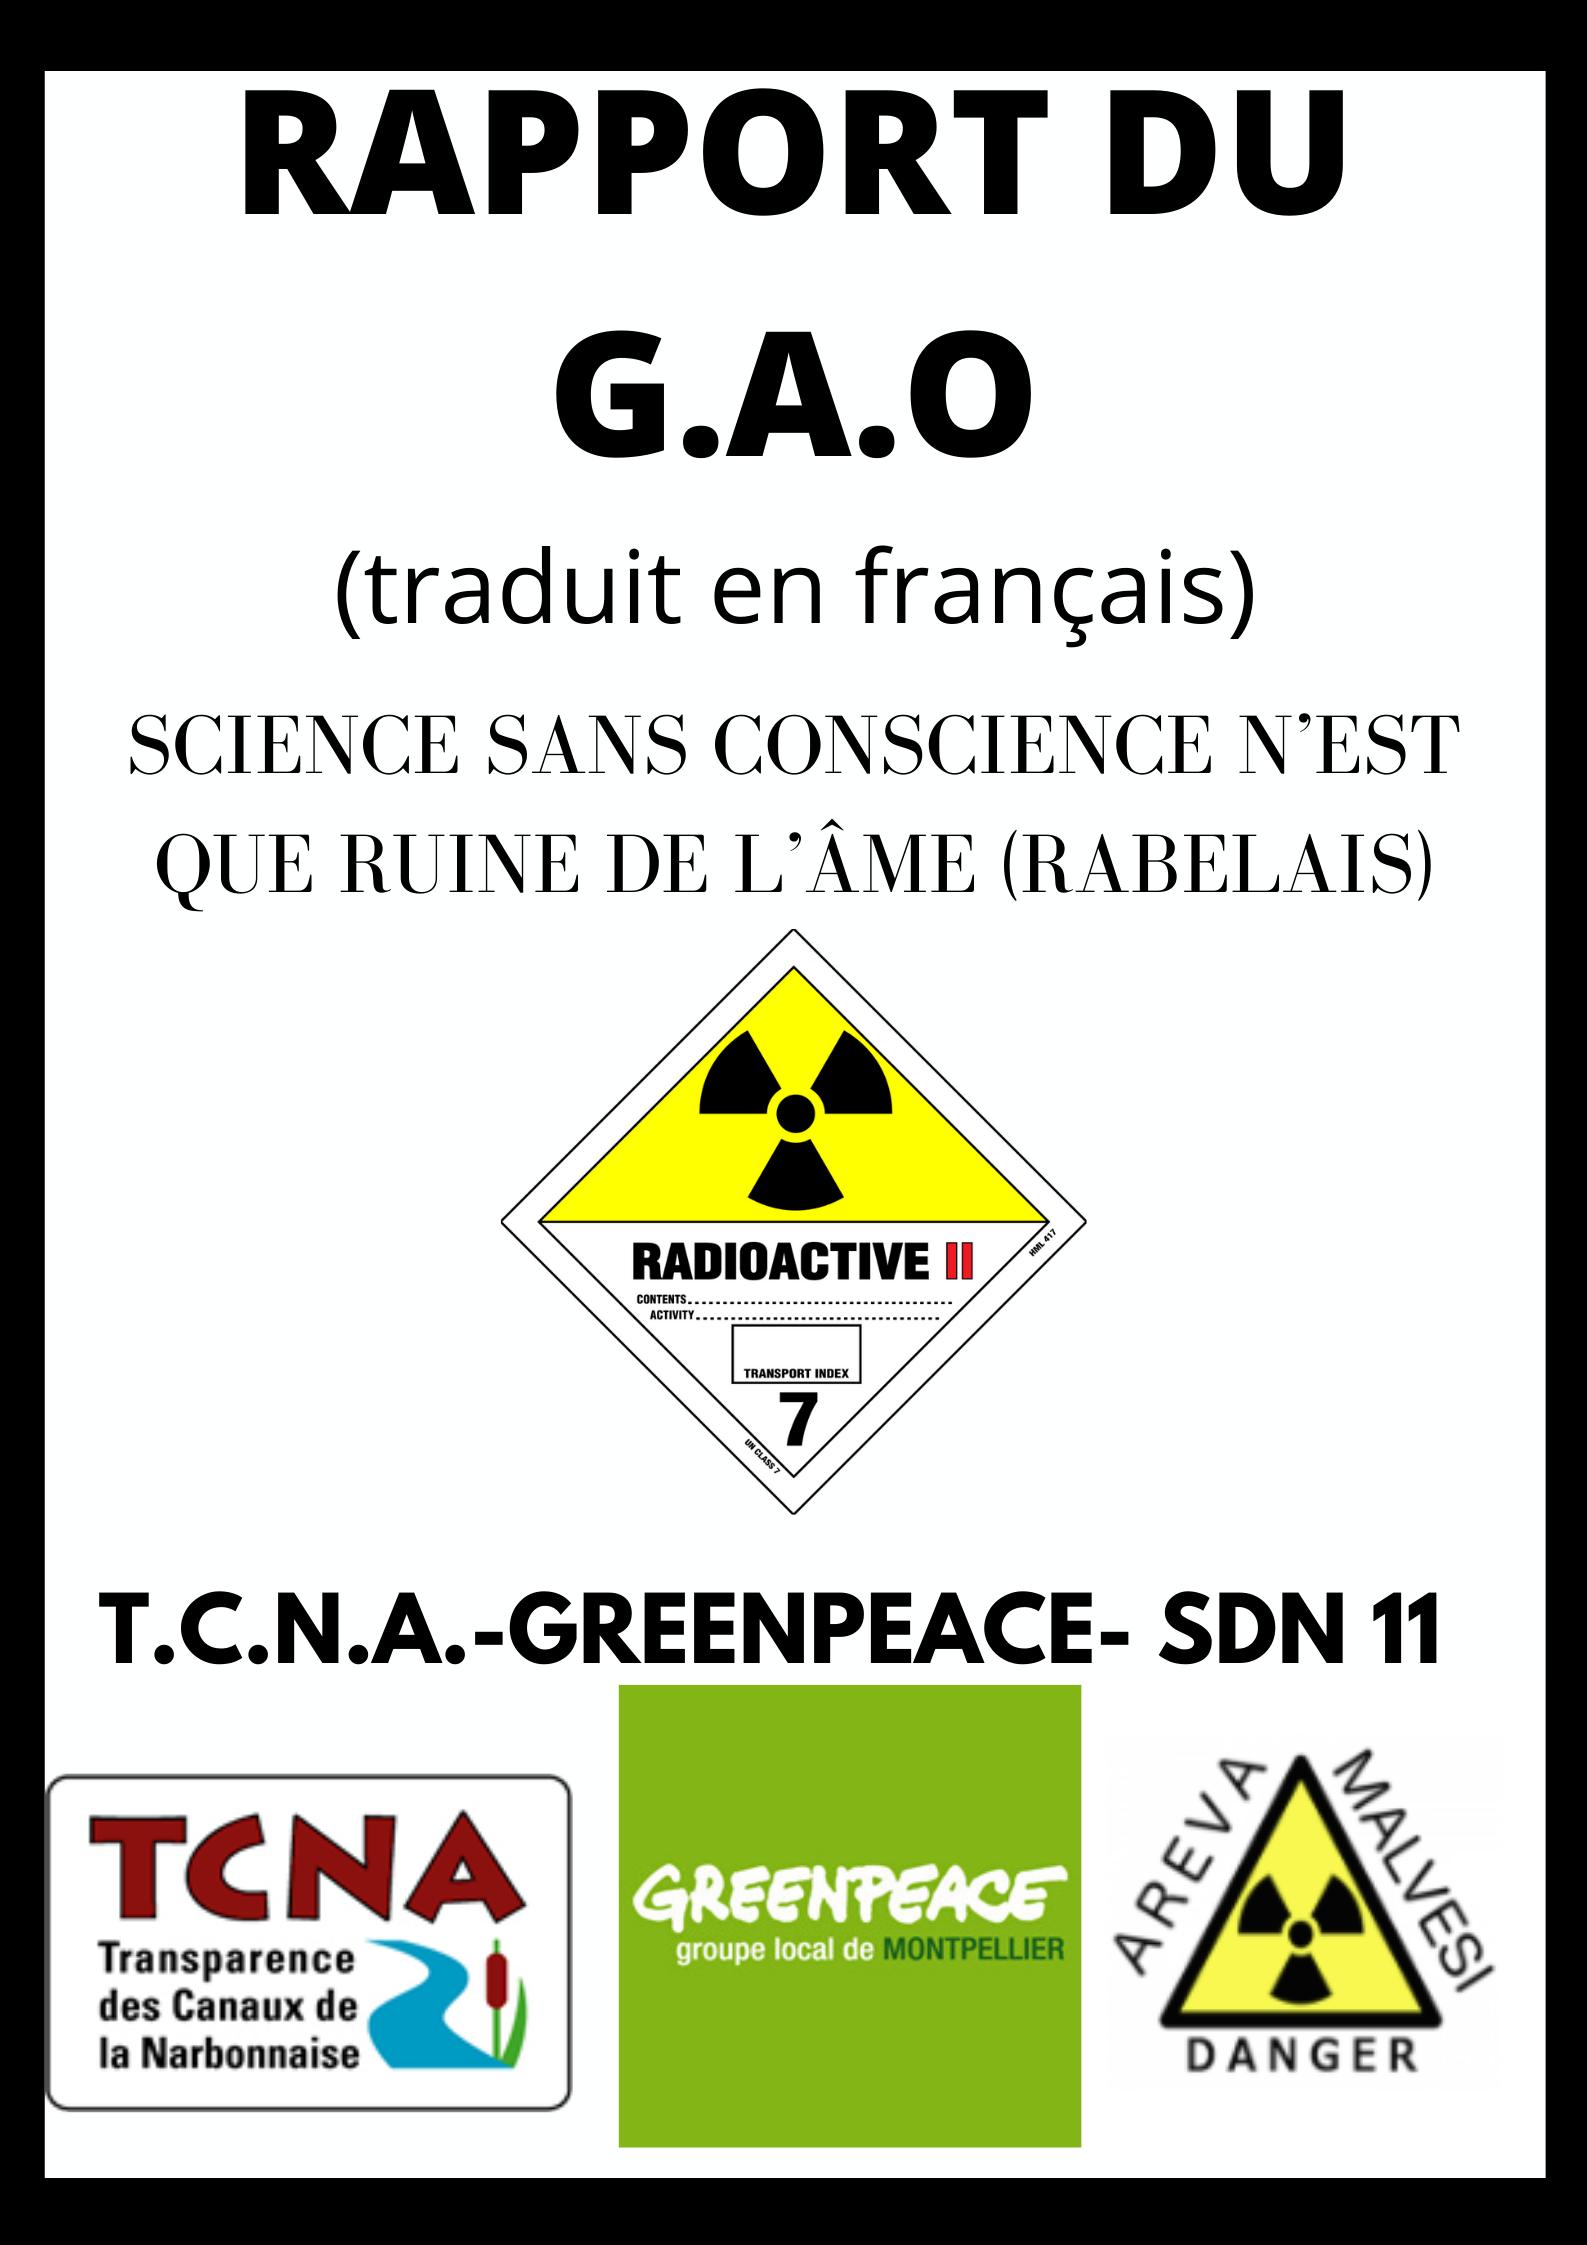 TRADUCTION COMPLETE DU RAPPORT du G.A.O